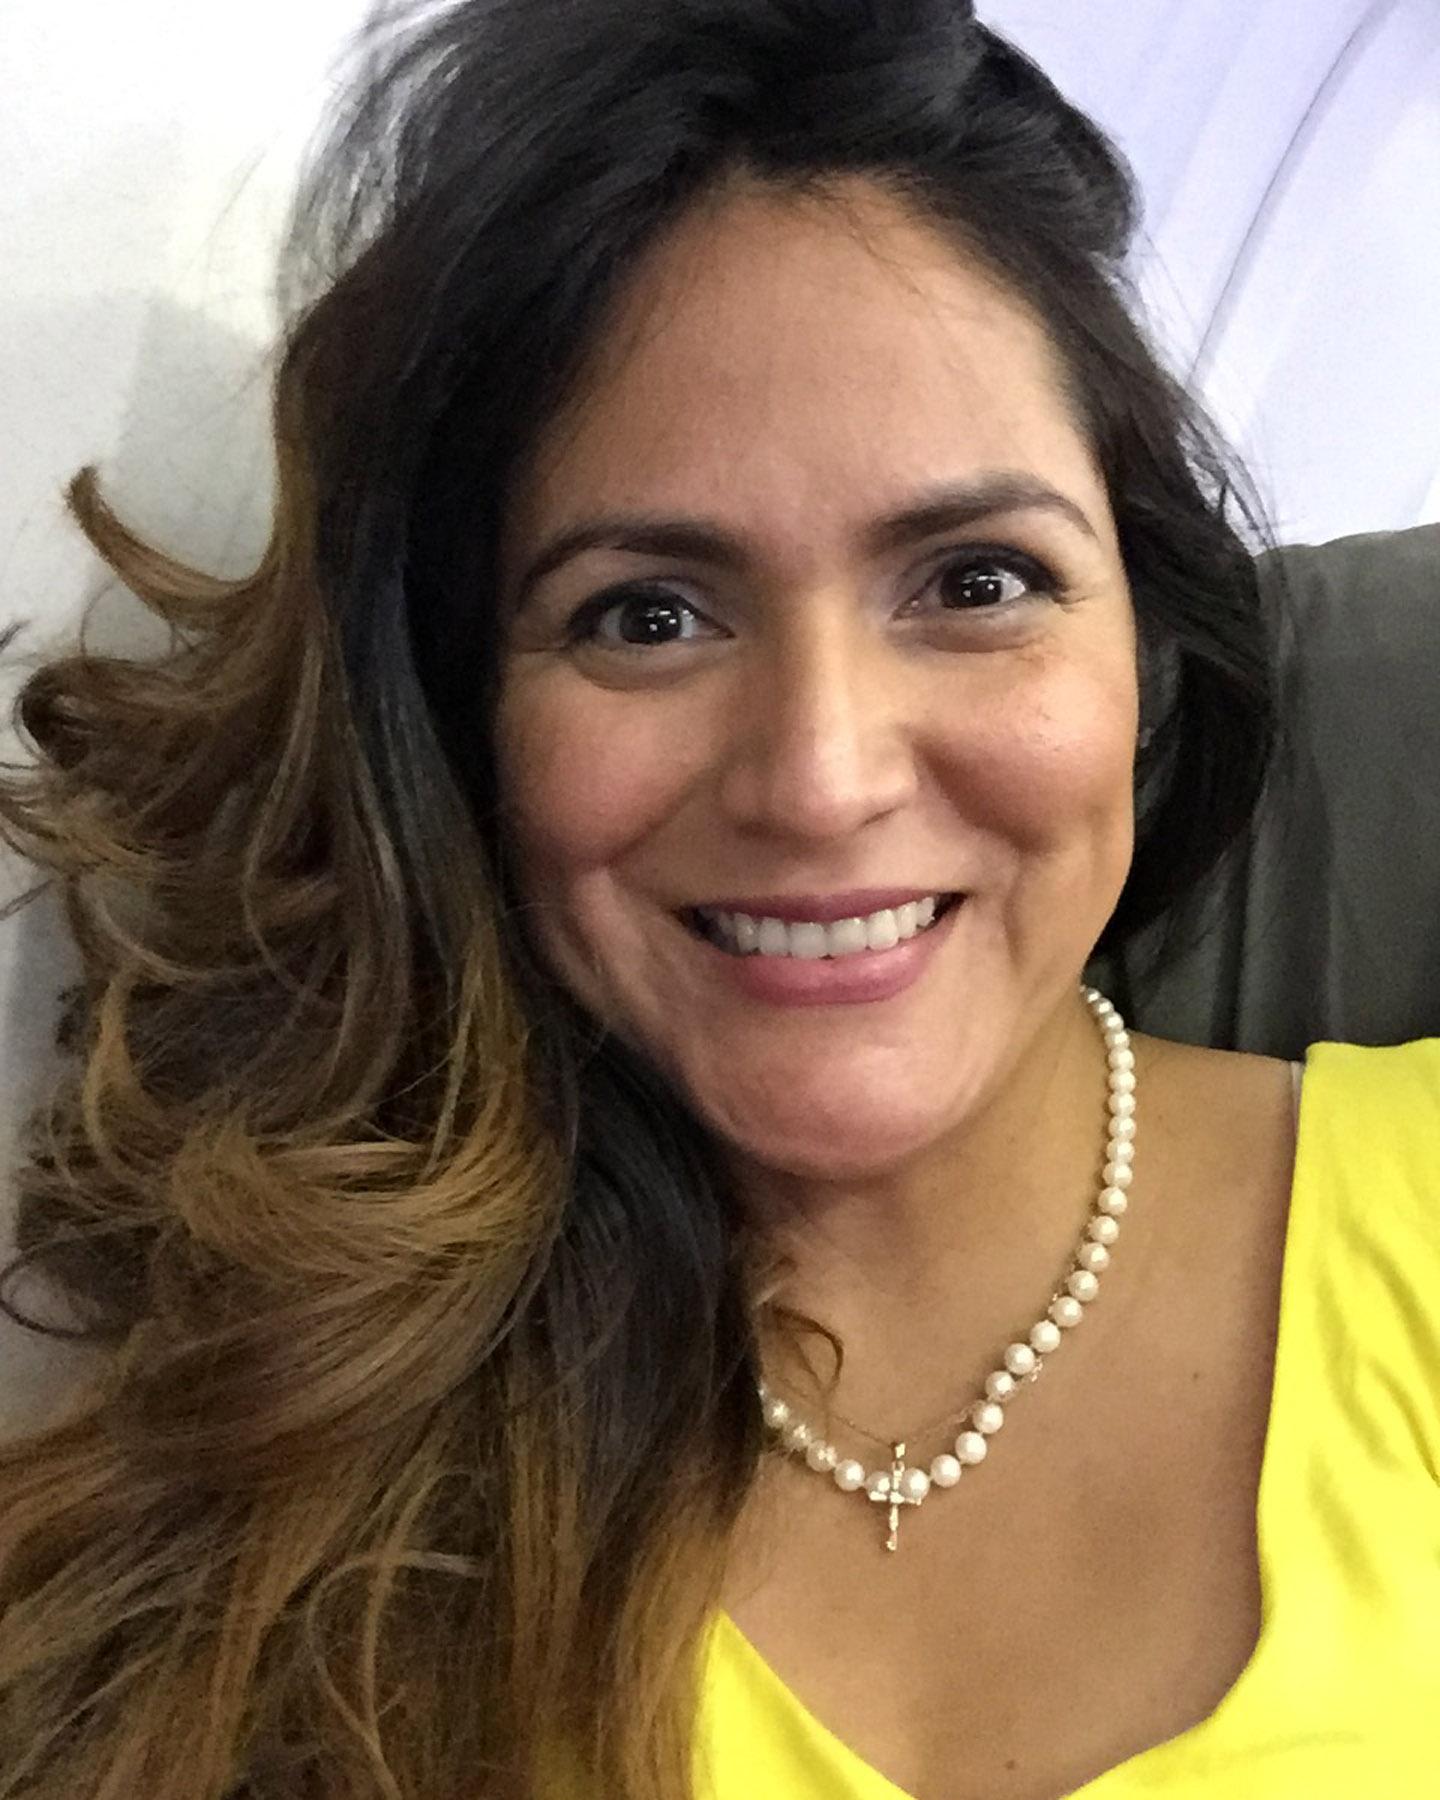 Alicia Tamas